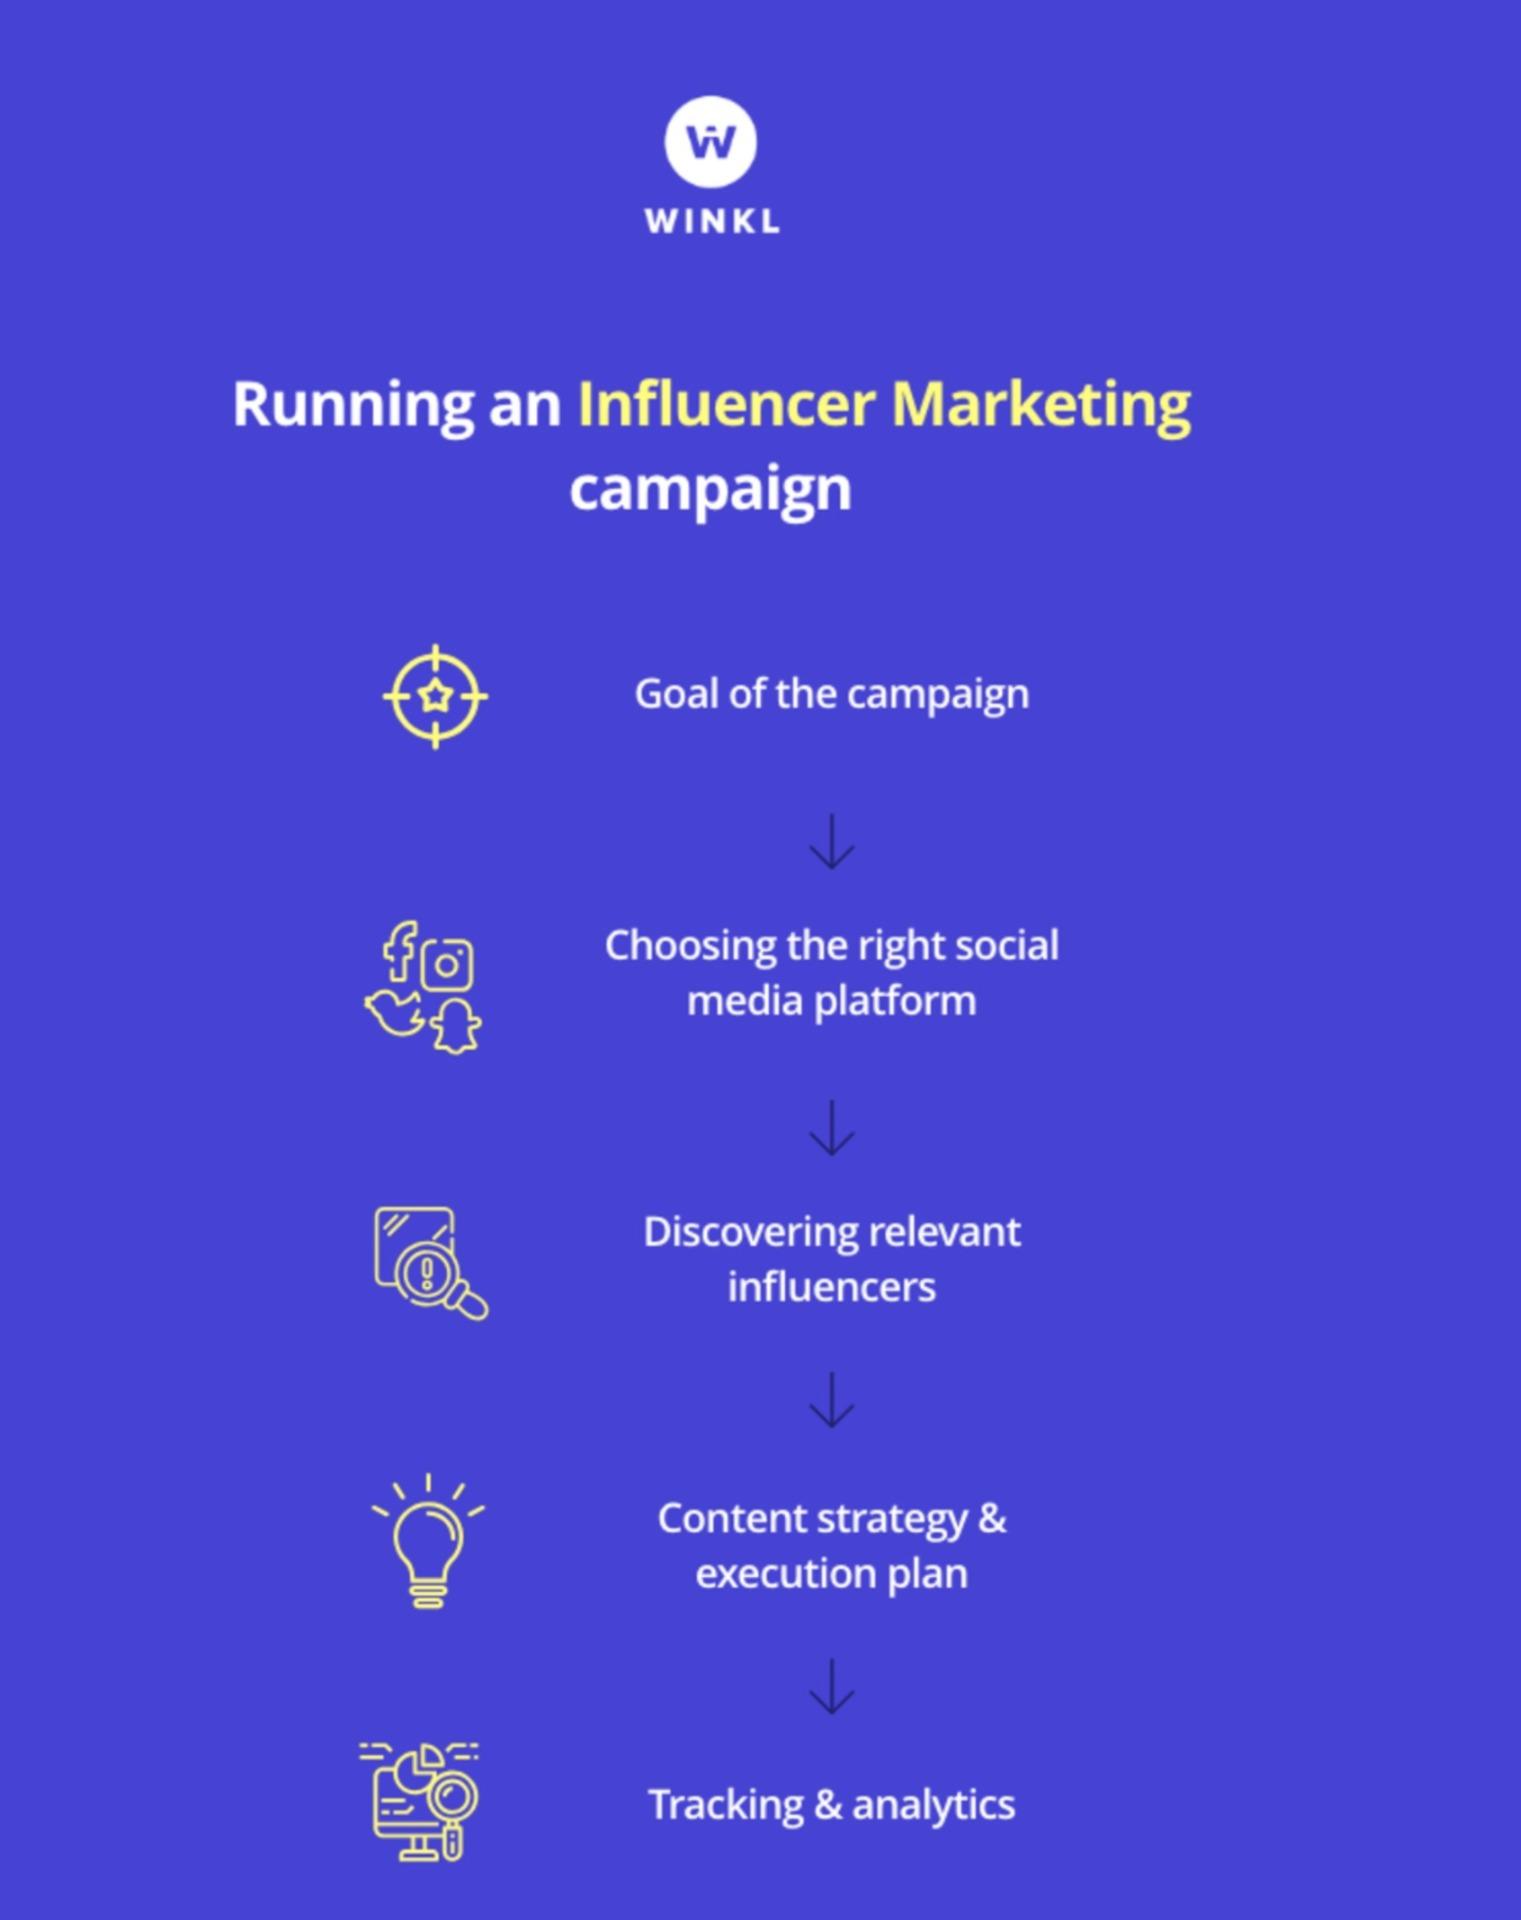 Winkl on Influener Marketing - Screenshot 2020-09-29 at 4